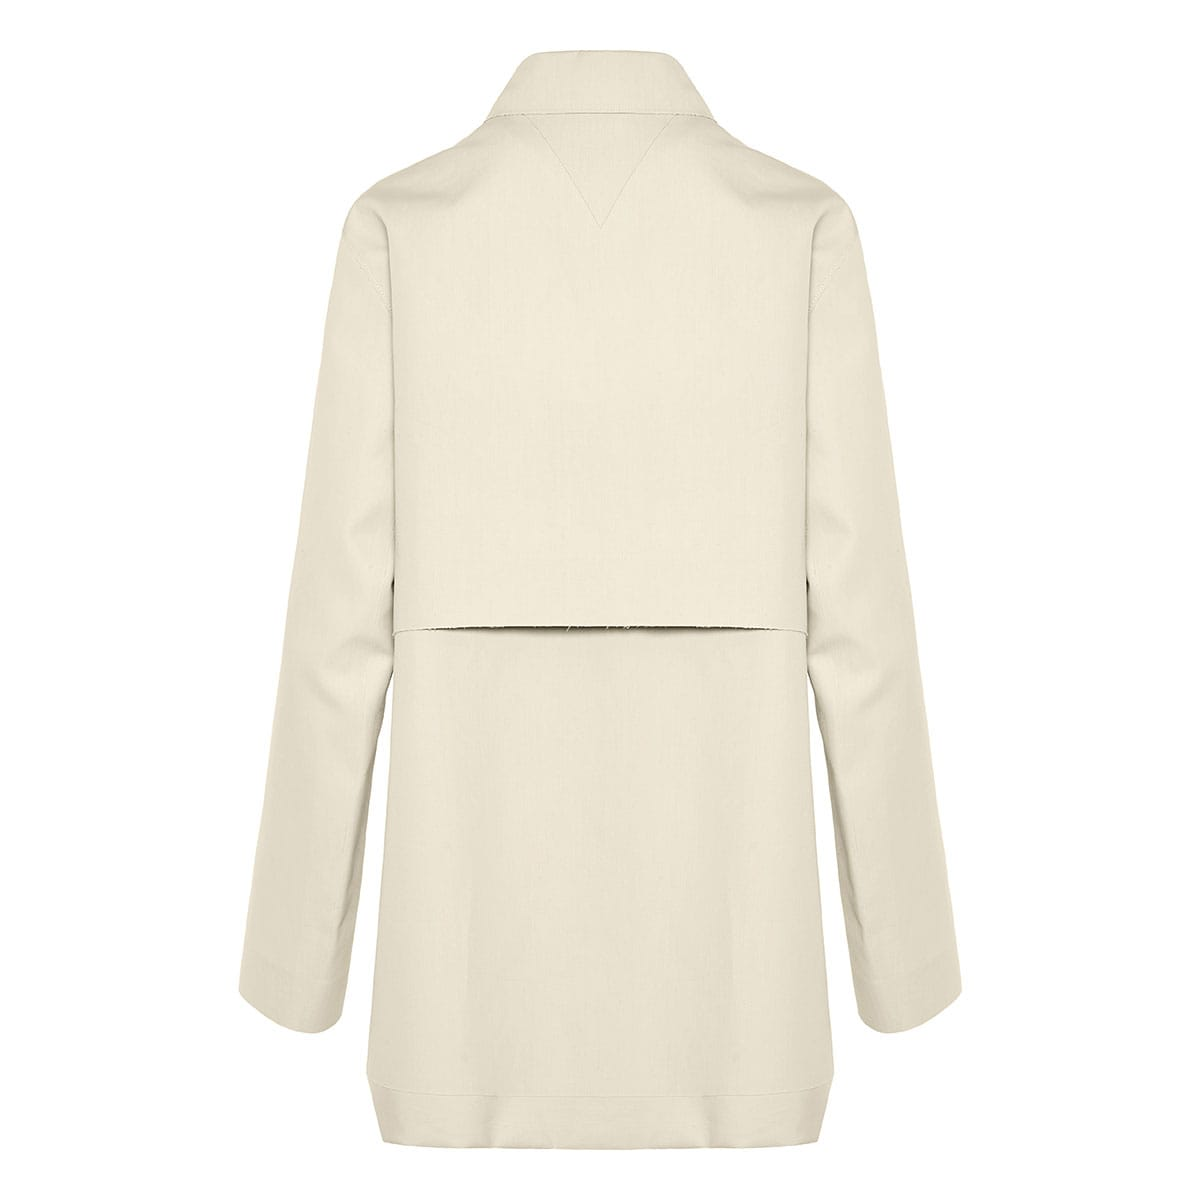 Button-embellished cotton jacket